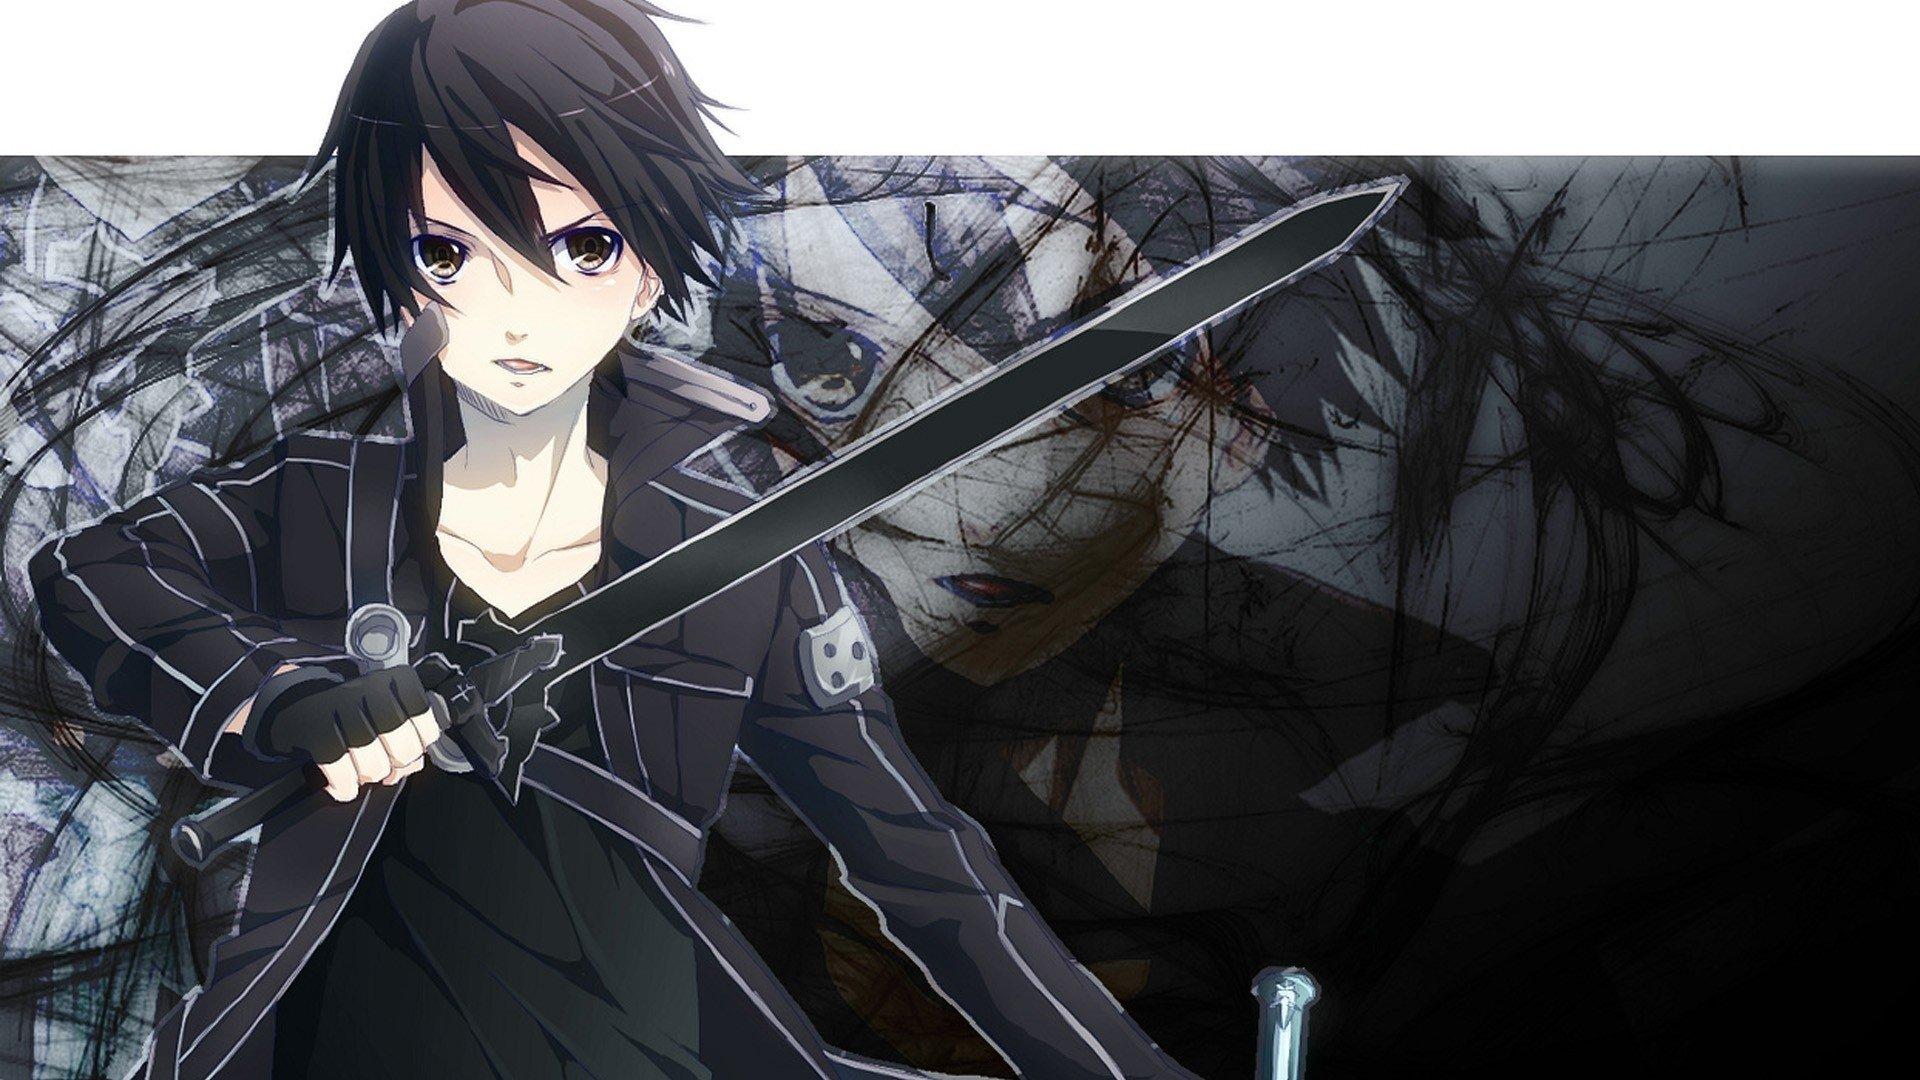 2460 Sword Art Online Hd Wallpapers Background Images